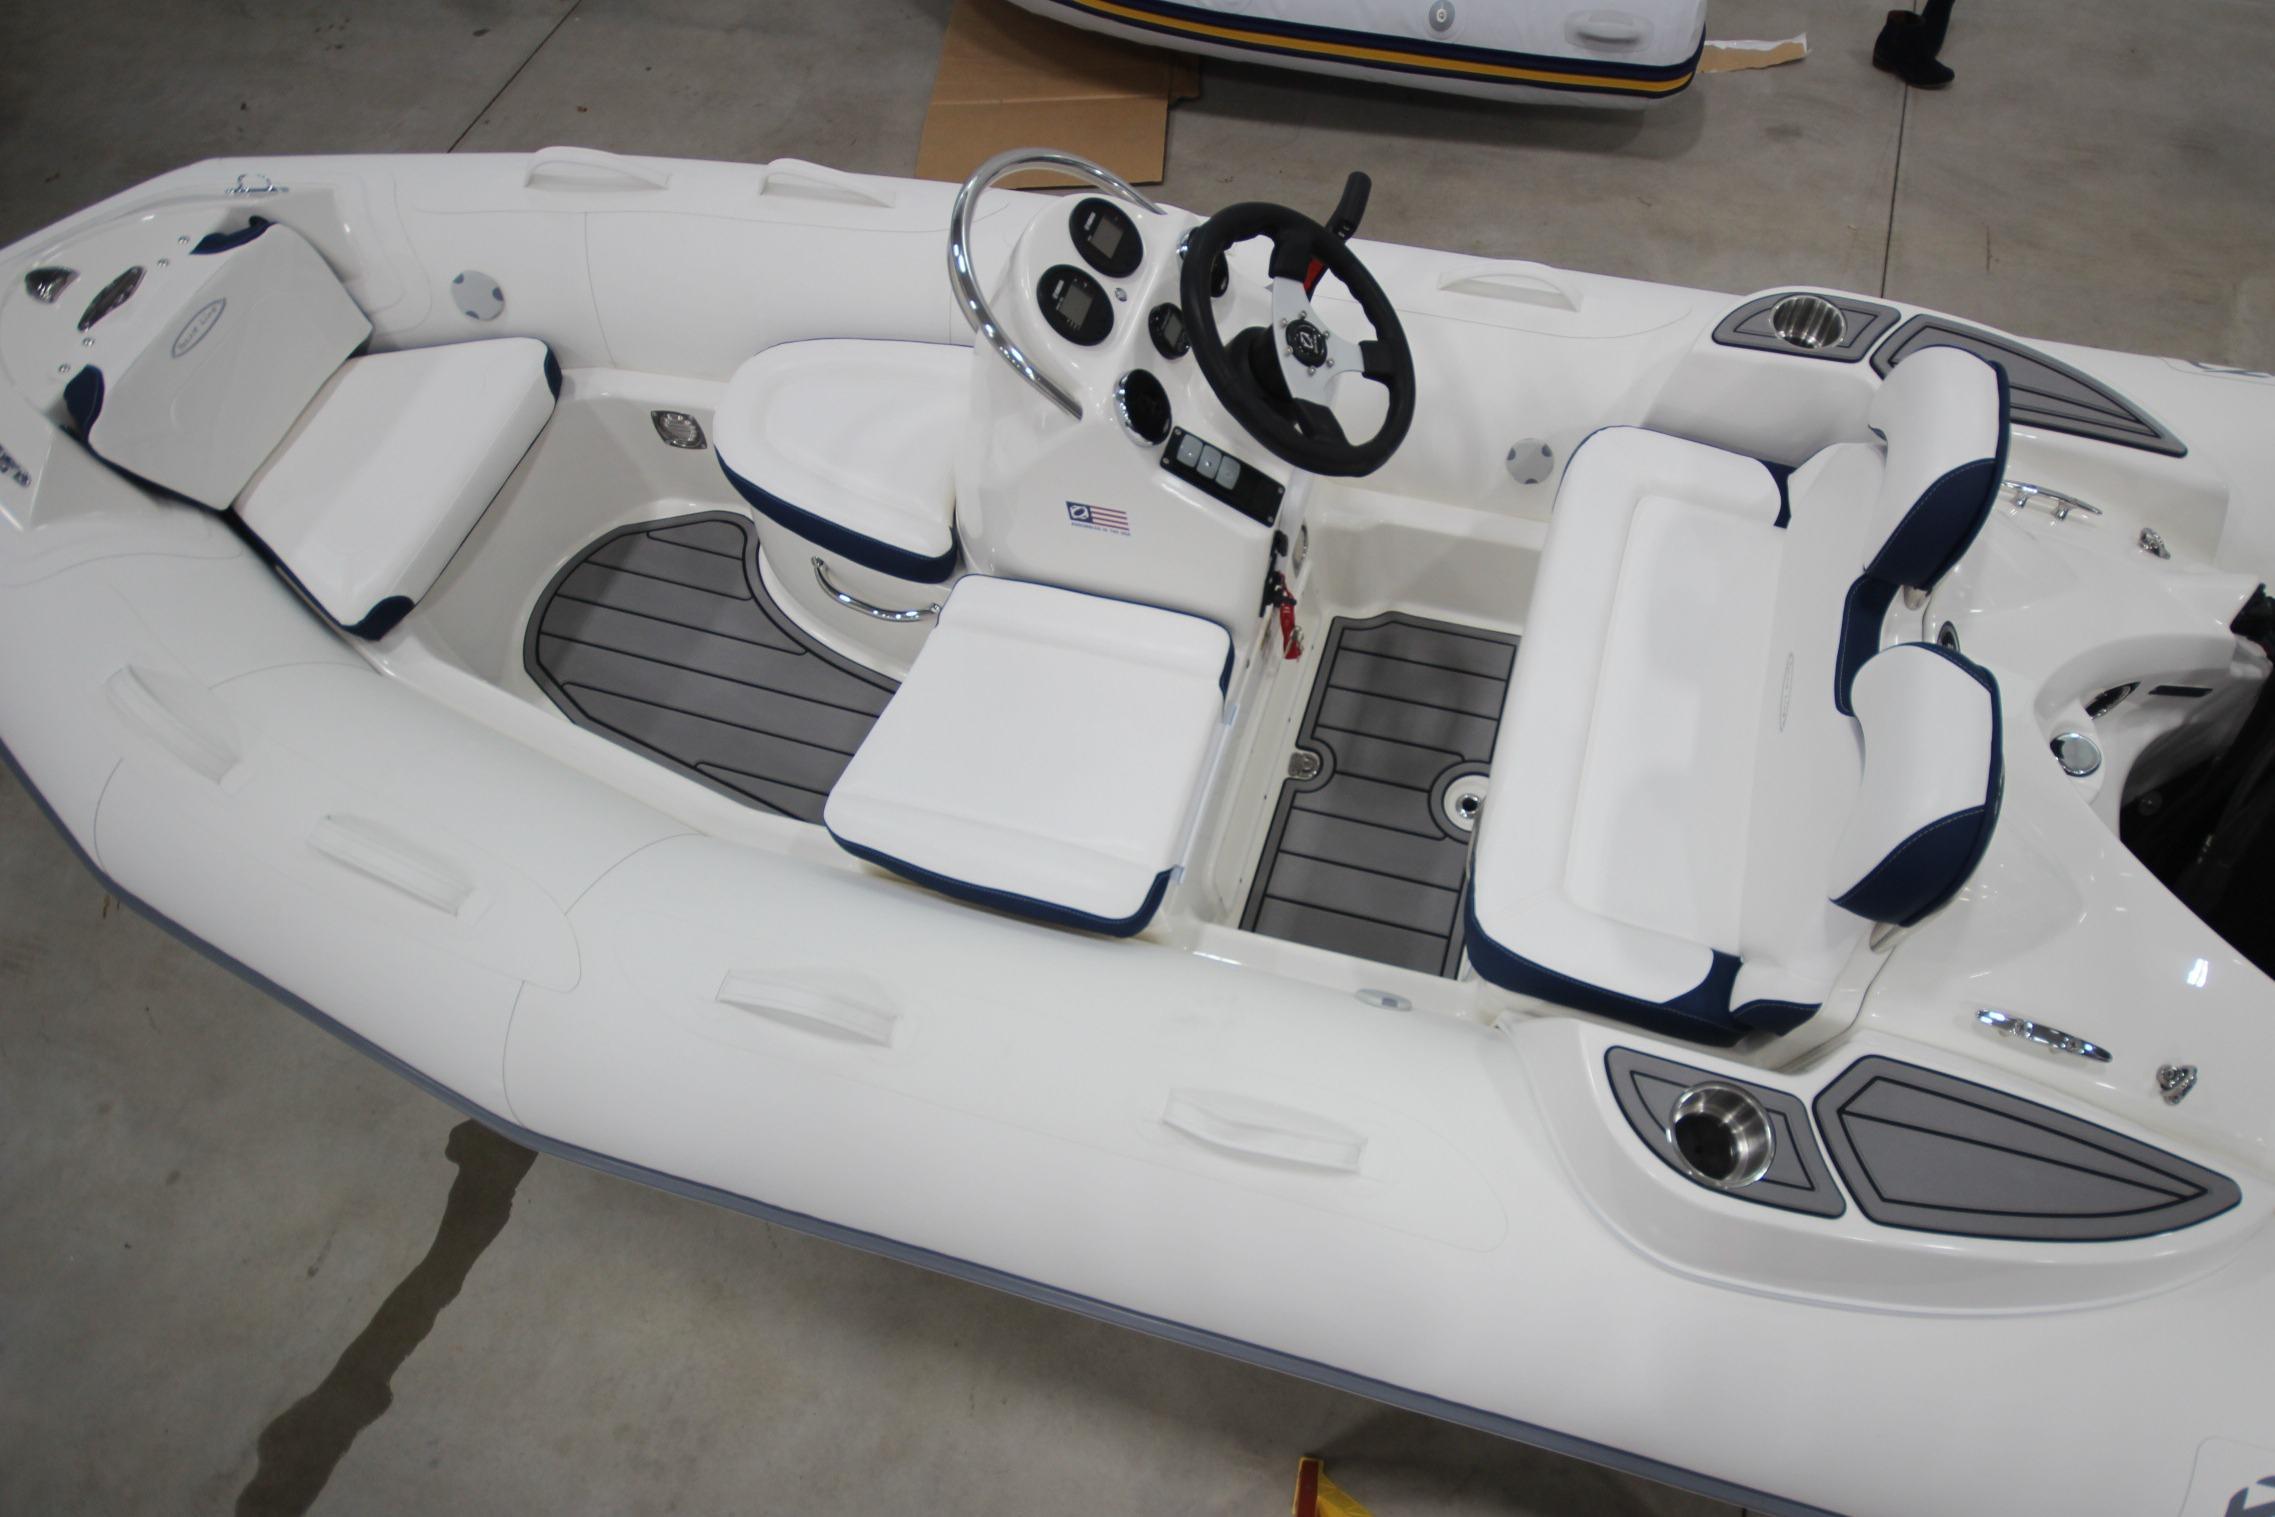 2021 Zodiac Yachtline 400 Deluxe NEO GL Edition 50hp In Stock, Image 23